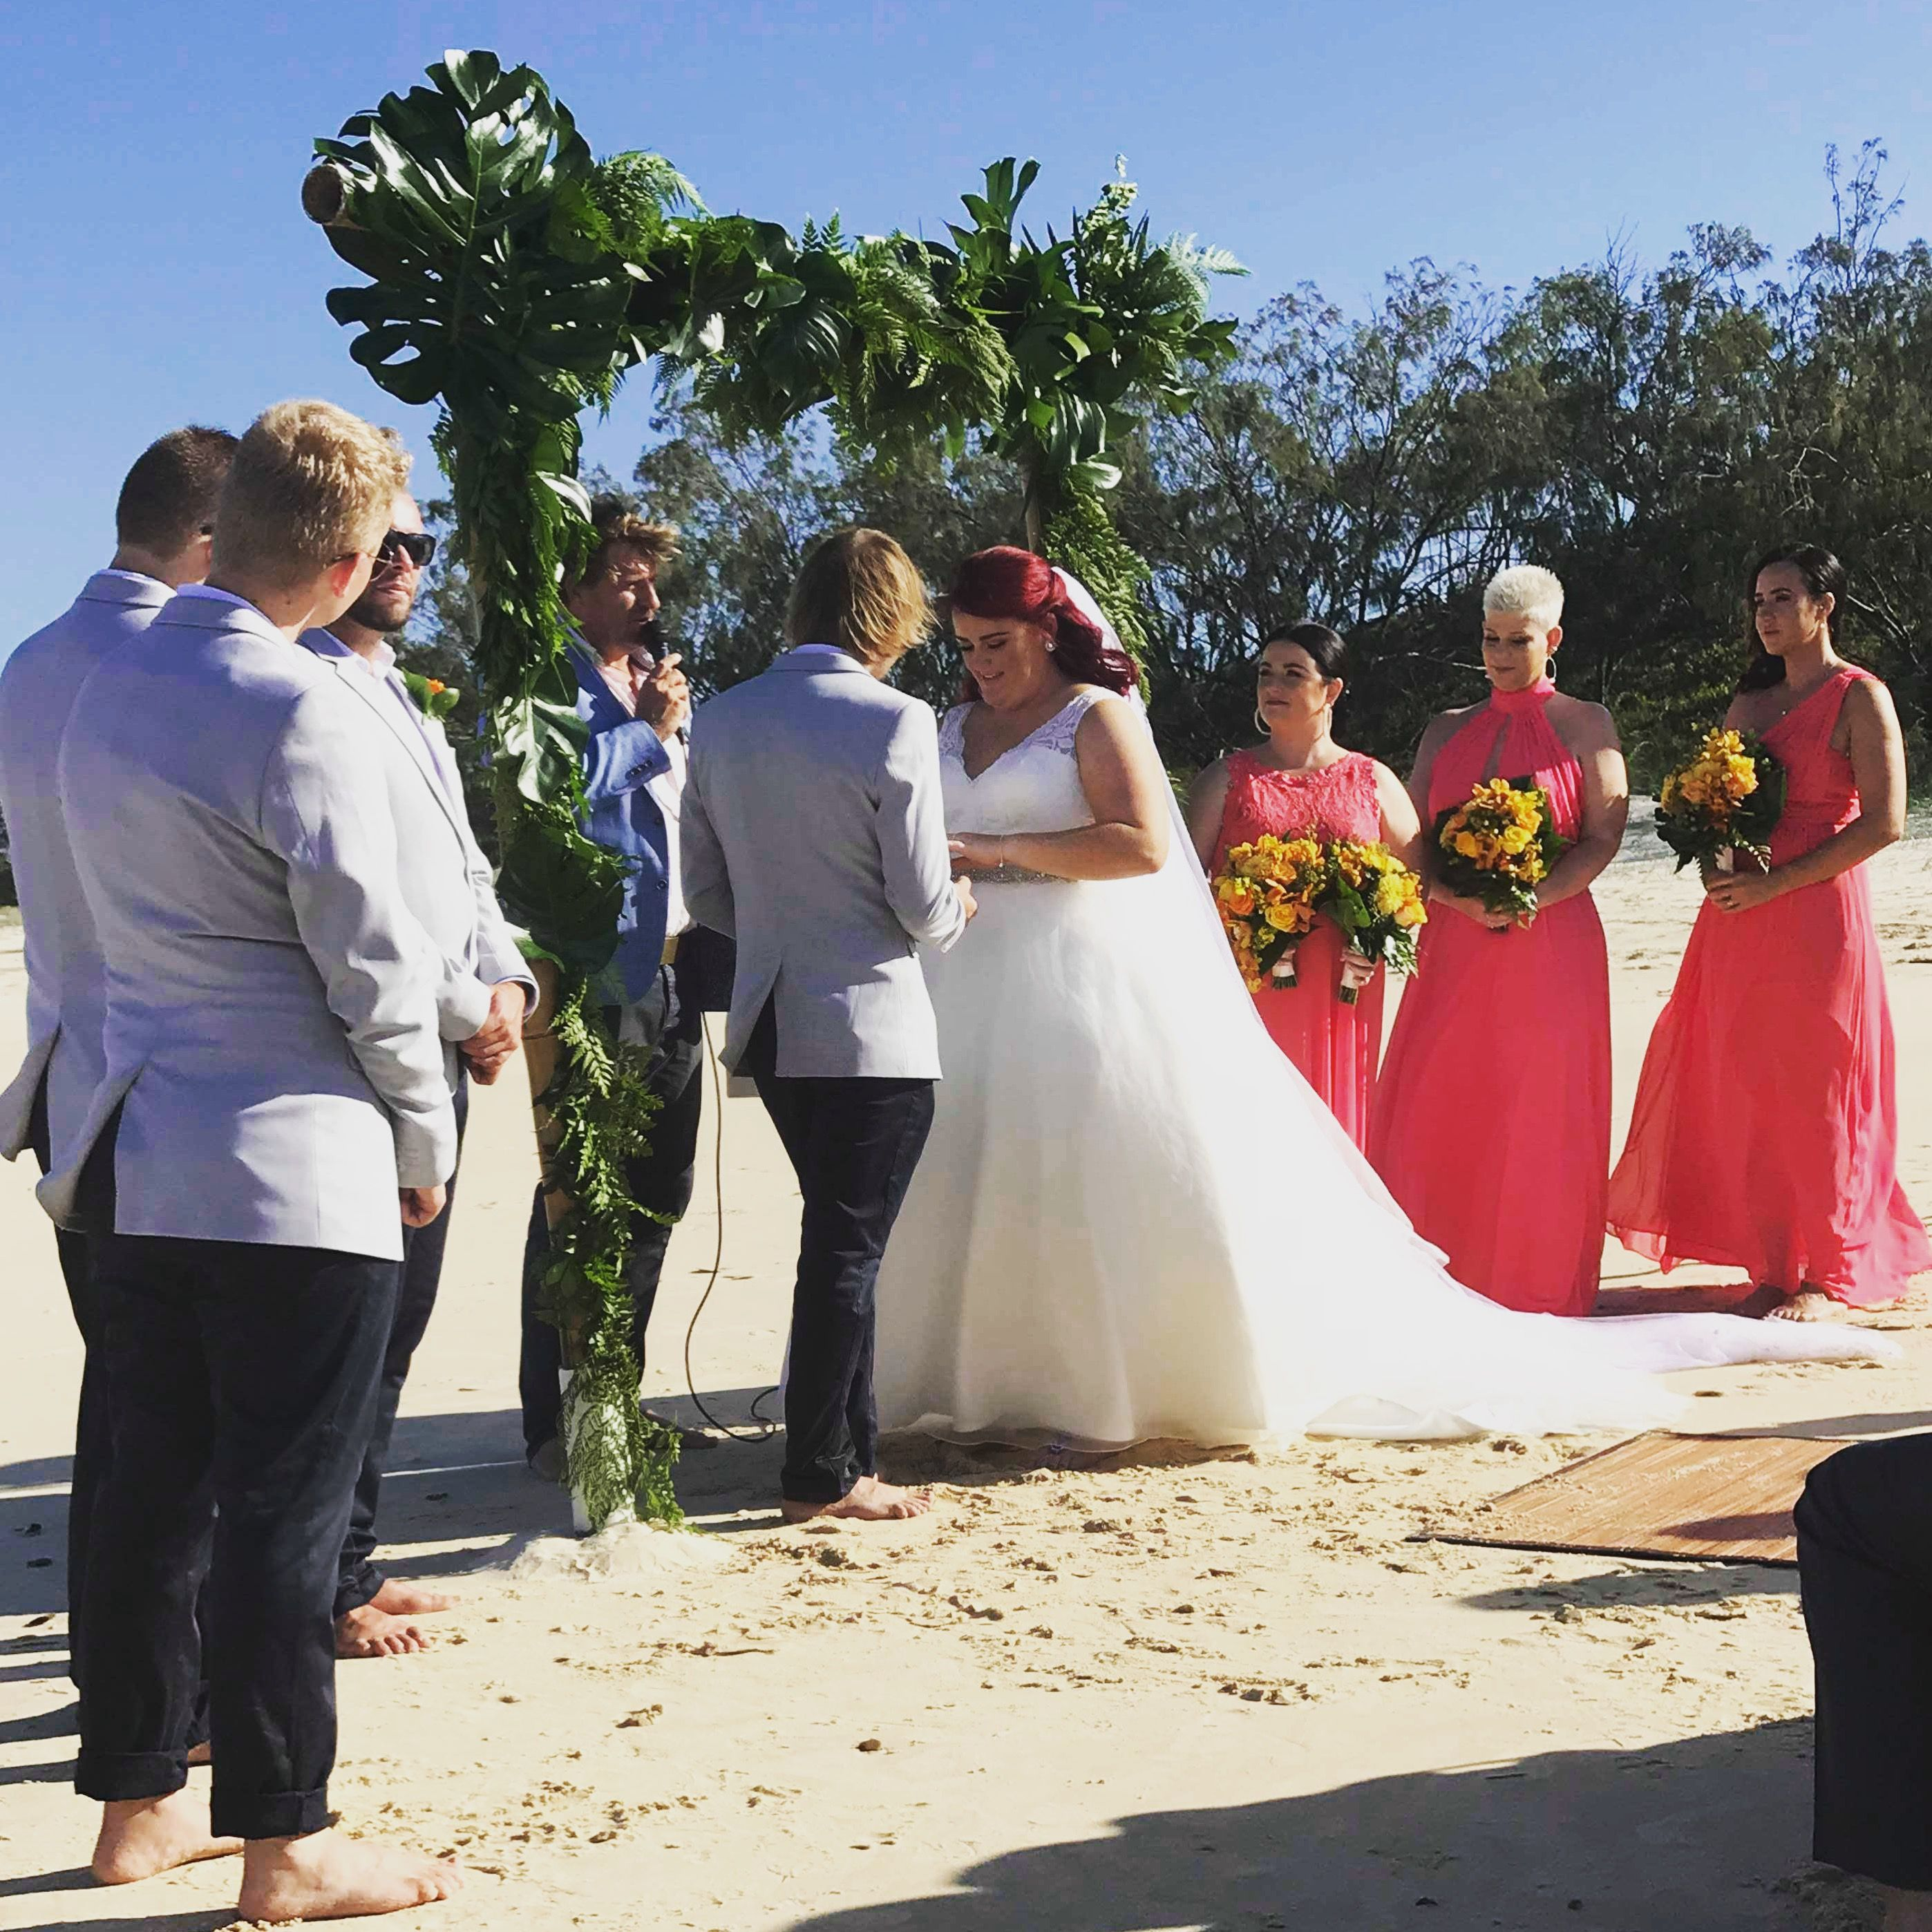 Beach wedding tropical arbor weddings pinterest arbors